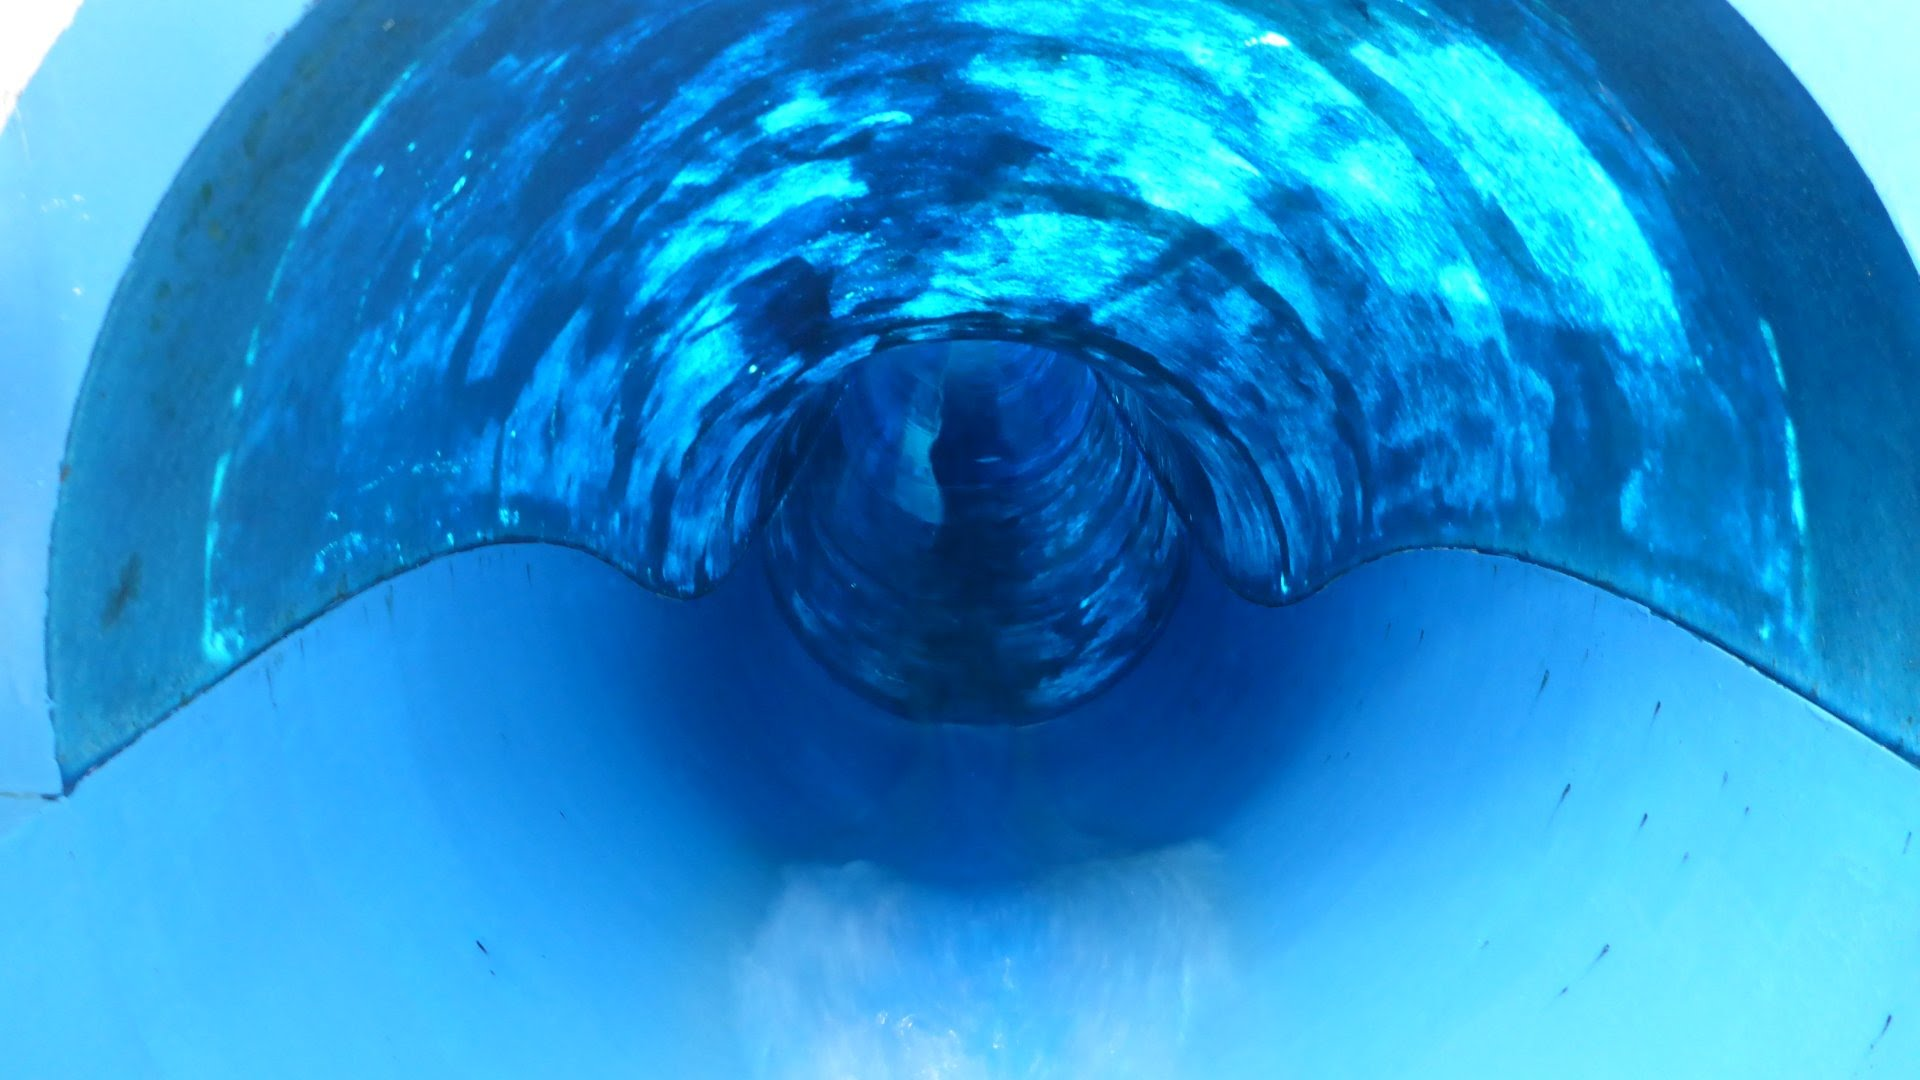 Blue Slide Aquaplouf Toboggan | Aquaboulevard Paris